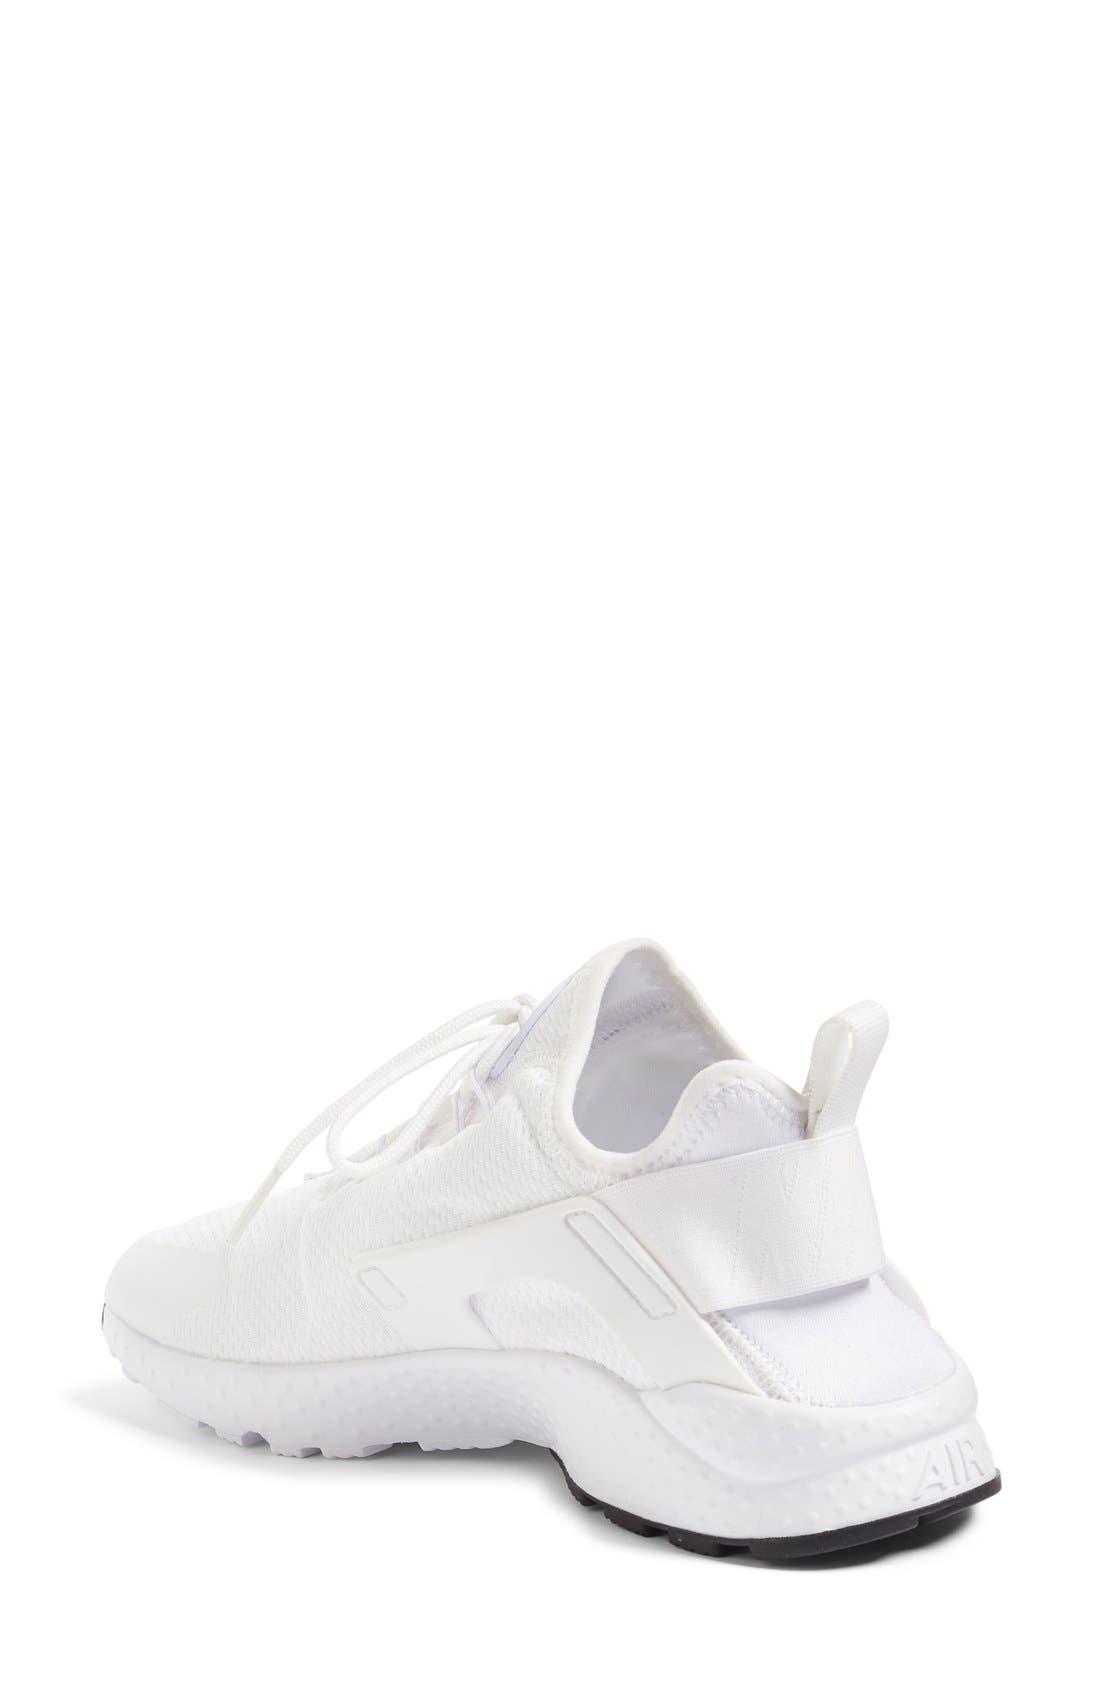 Air Huarache Sneaker,                             Alternate thumbnail 58, color,